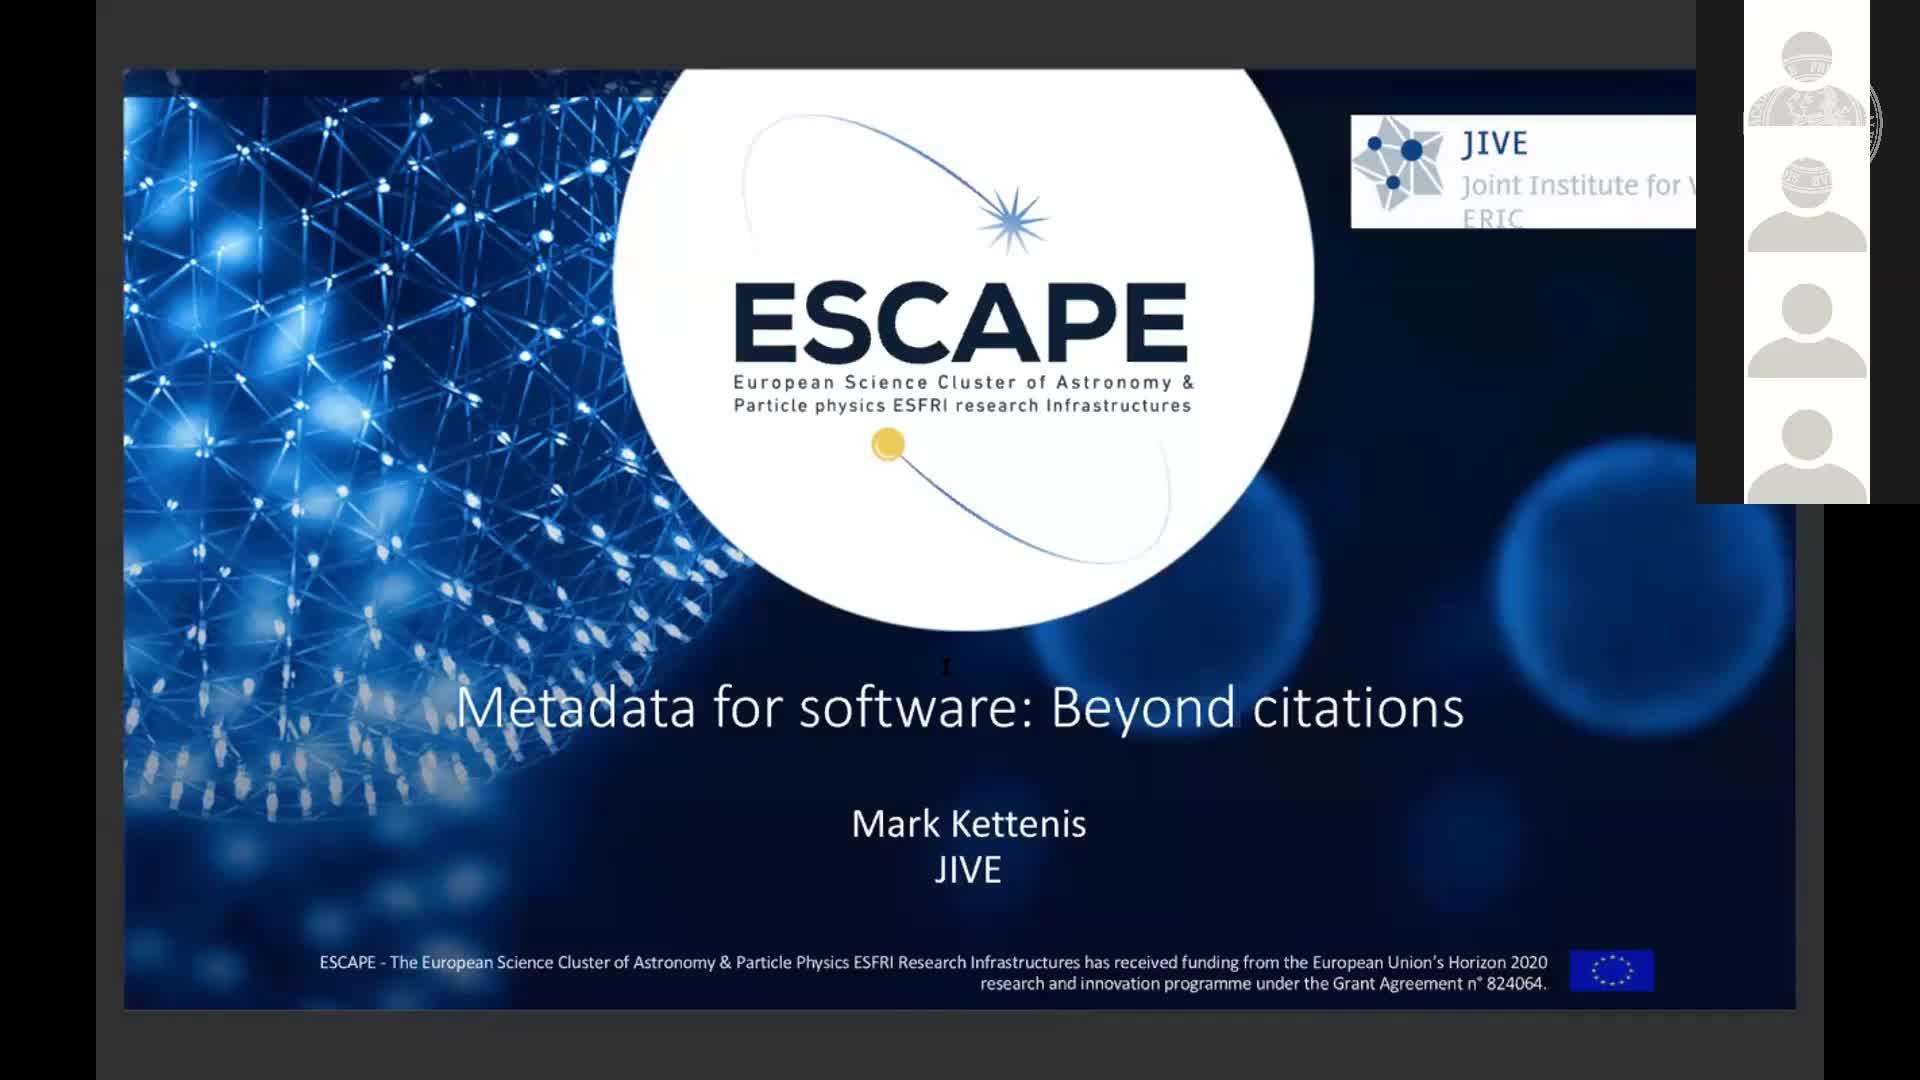 Software metadata beyond citations preview image